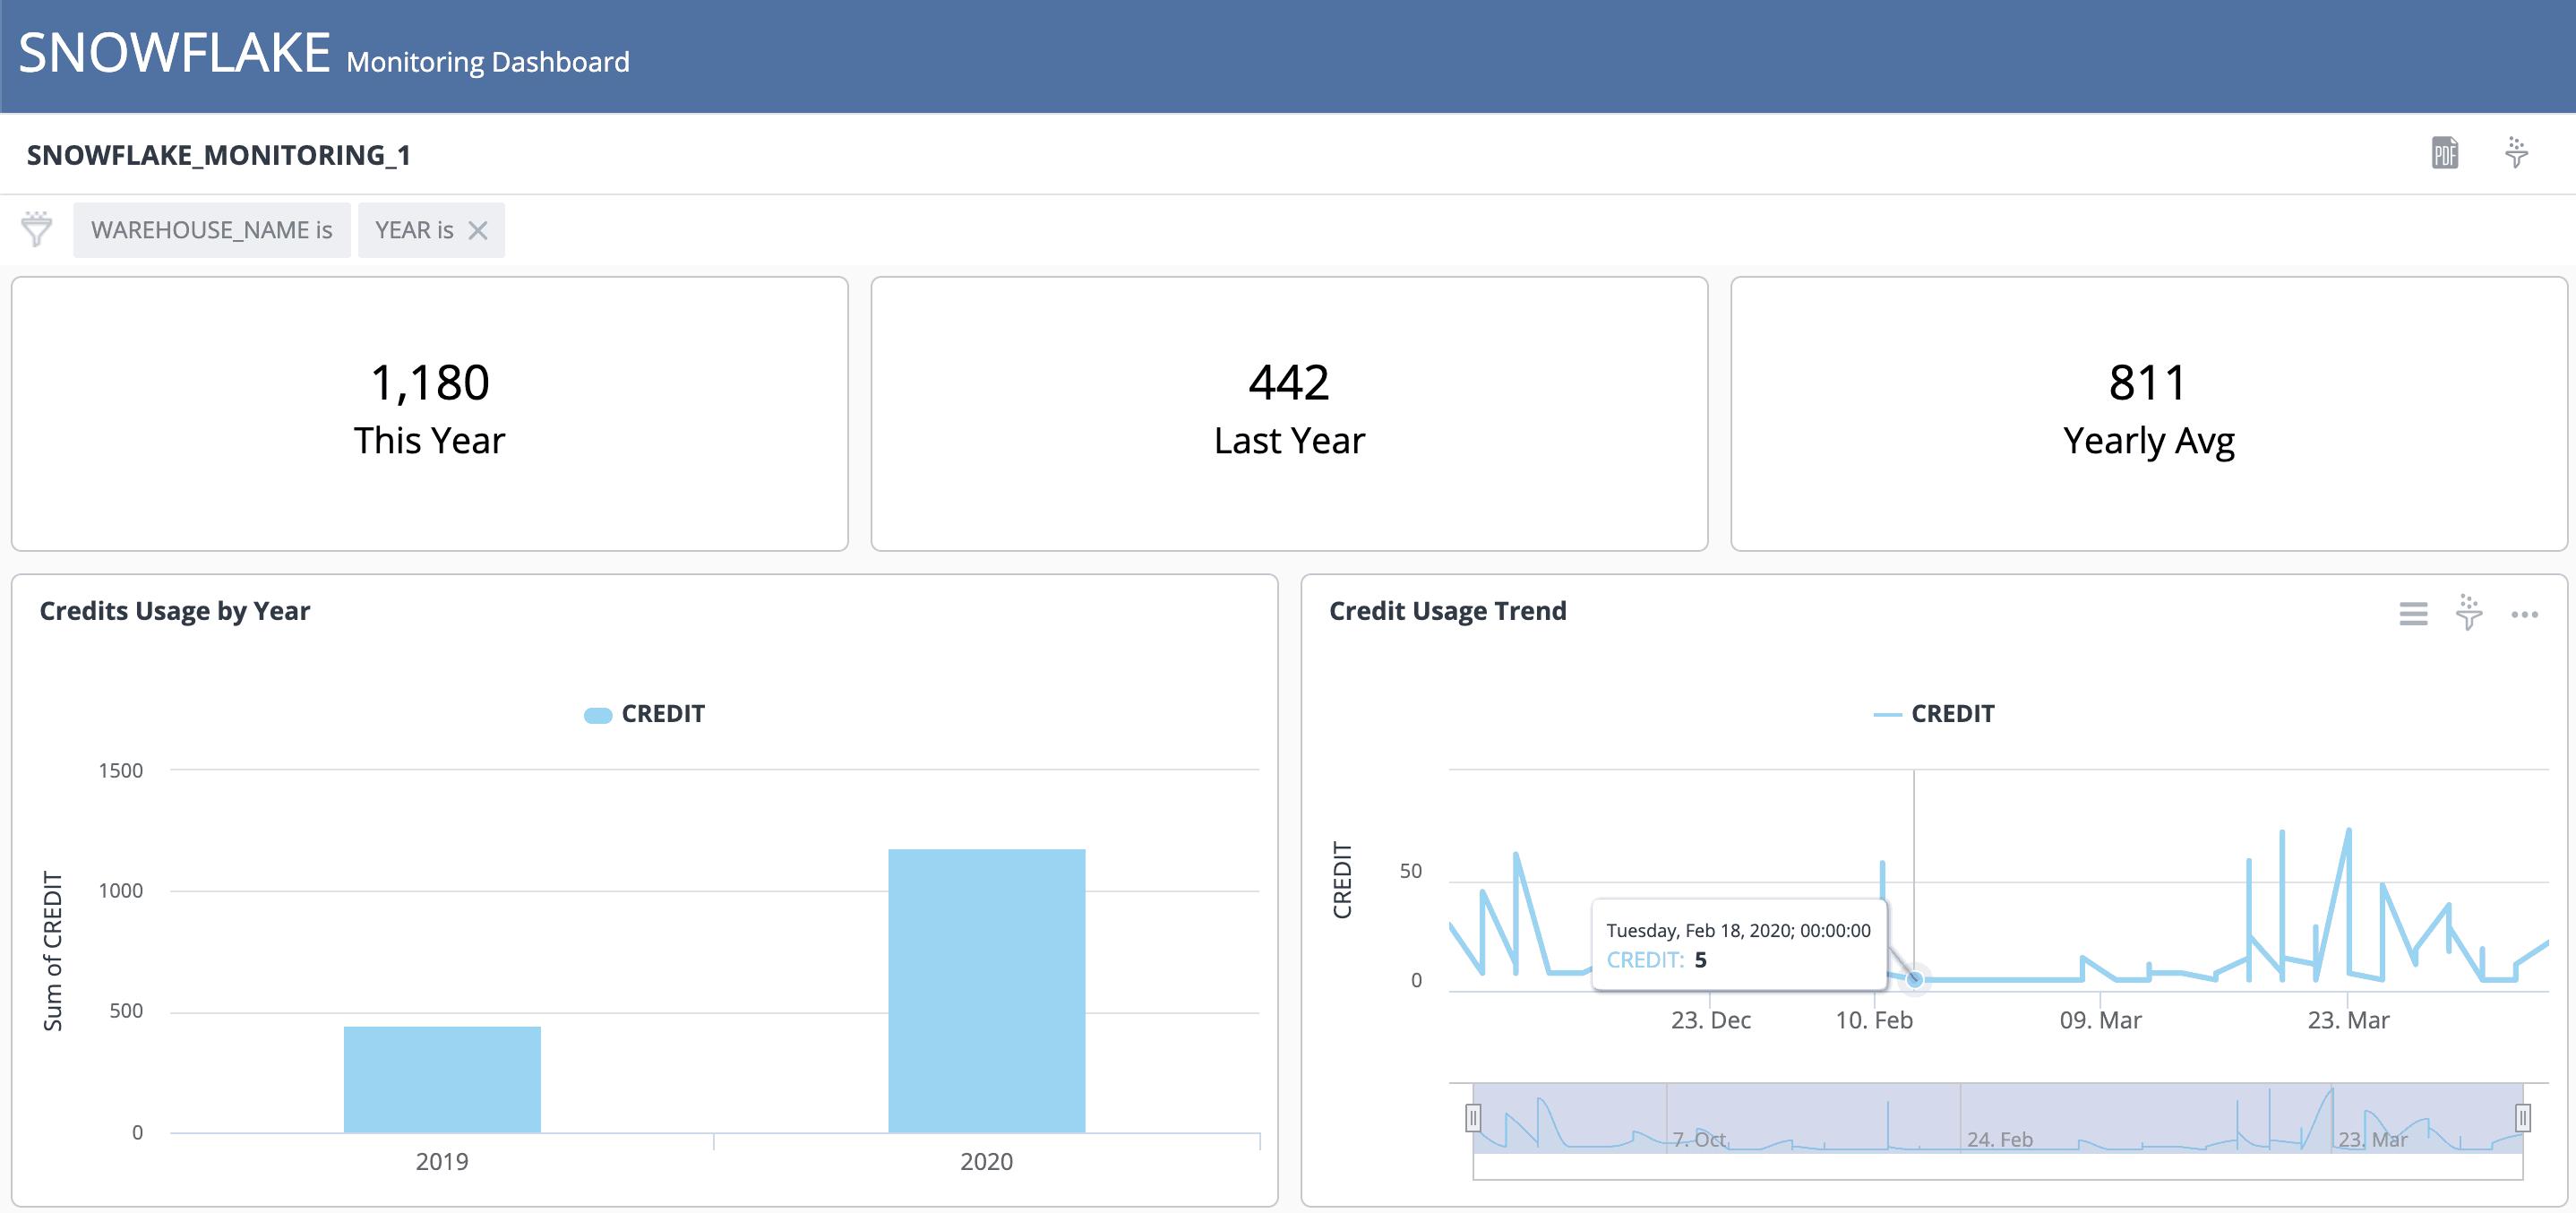 snowflake monitoring 1